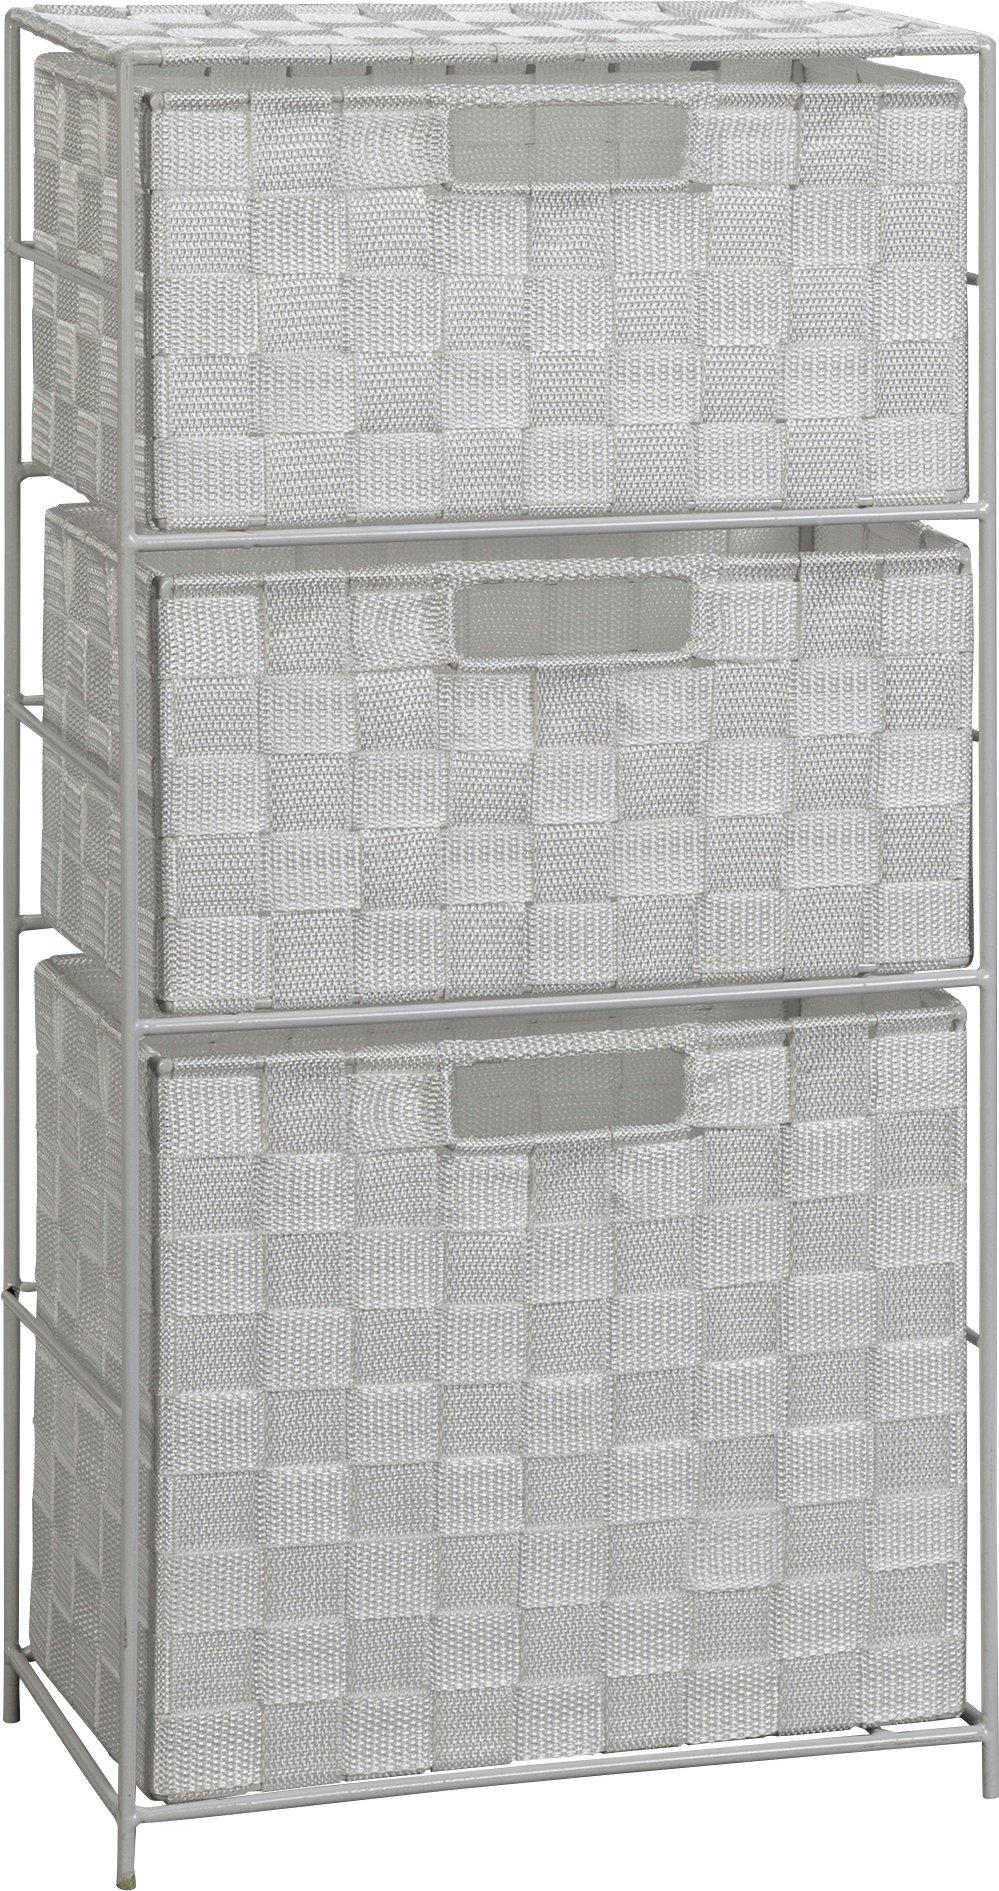 1/2 Price : Wide 3 Drawer Bathroom Storage Unit, Now £12 @ Argos ( Free C&C )